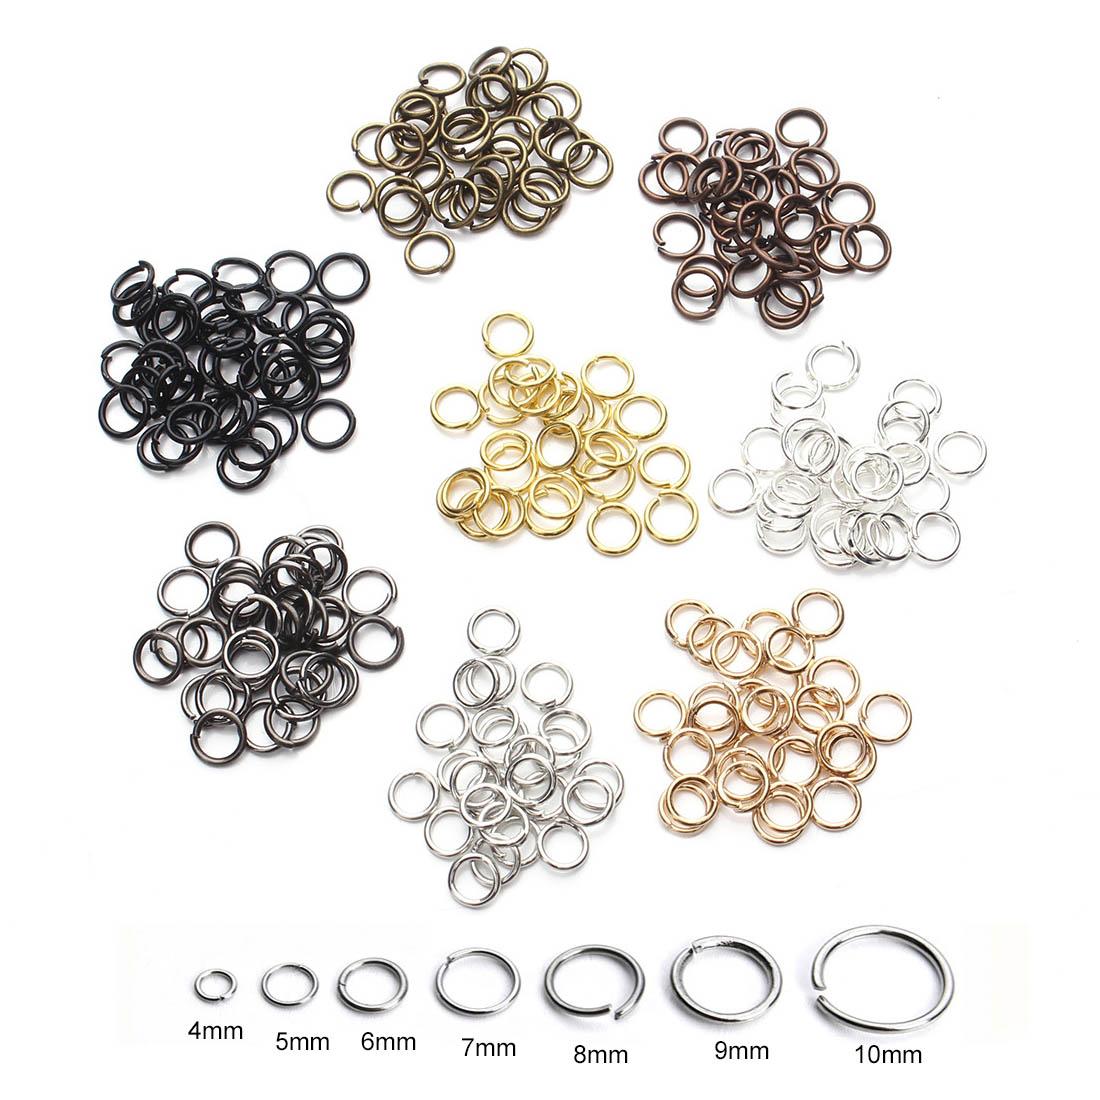 200pcs/bag 4/5/6/7/8/10mm Metal DIY Jewelry Findings Open Single Loops Jump Rings & Split Ring For Jewelry Making Findings